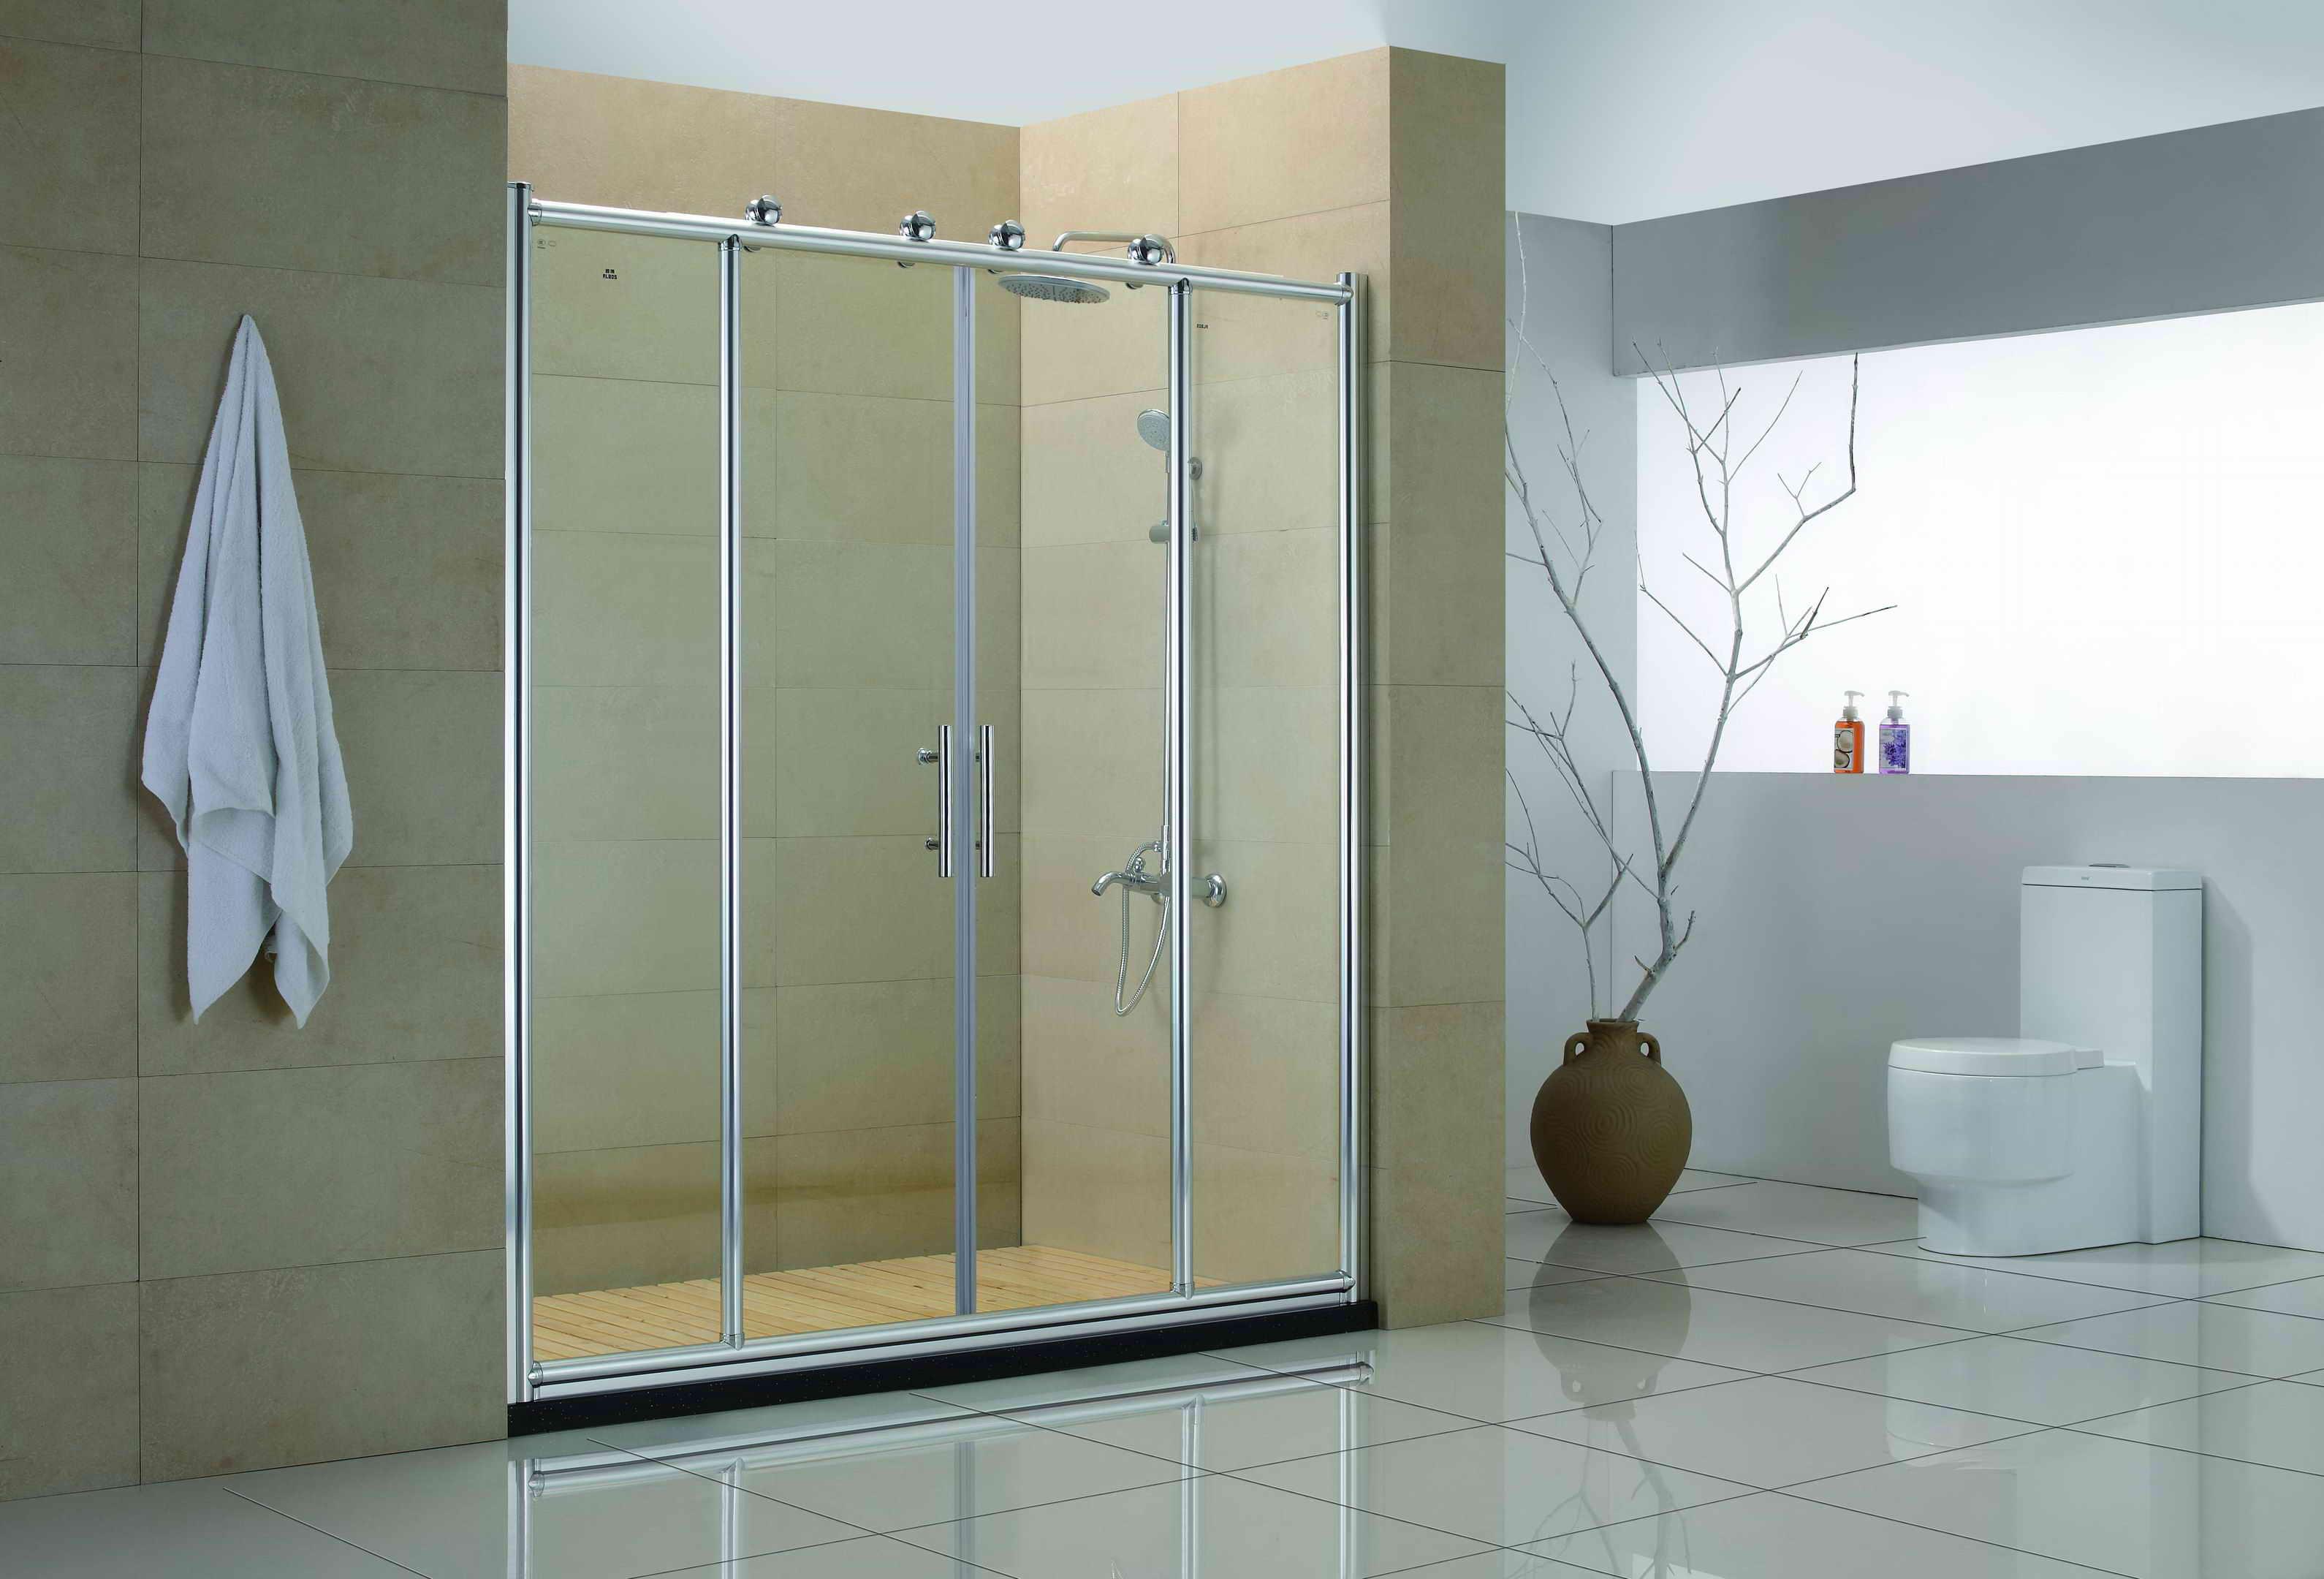 interior-bathroom-modish-chrome-frame-sliding-glass-shower-doors-for-modern-shower-room-ideas-as-well-as-large-bathroom-designs-showy-glass-shower-doors-luxurious-enclosure-design